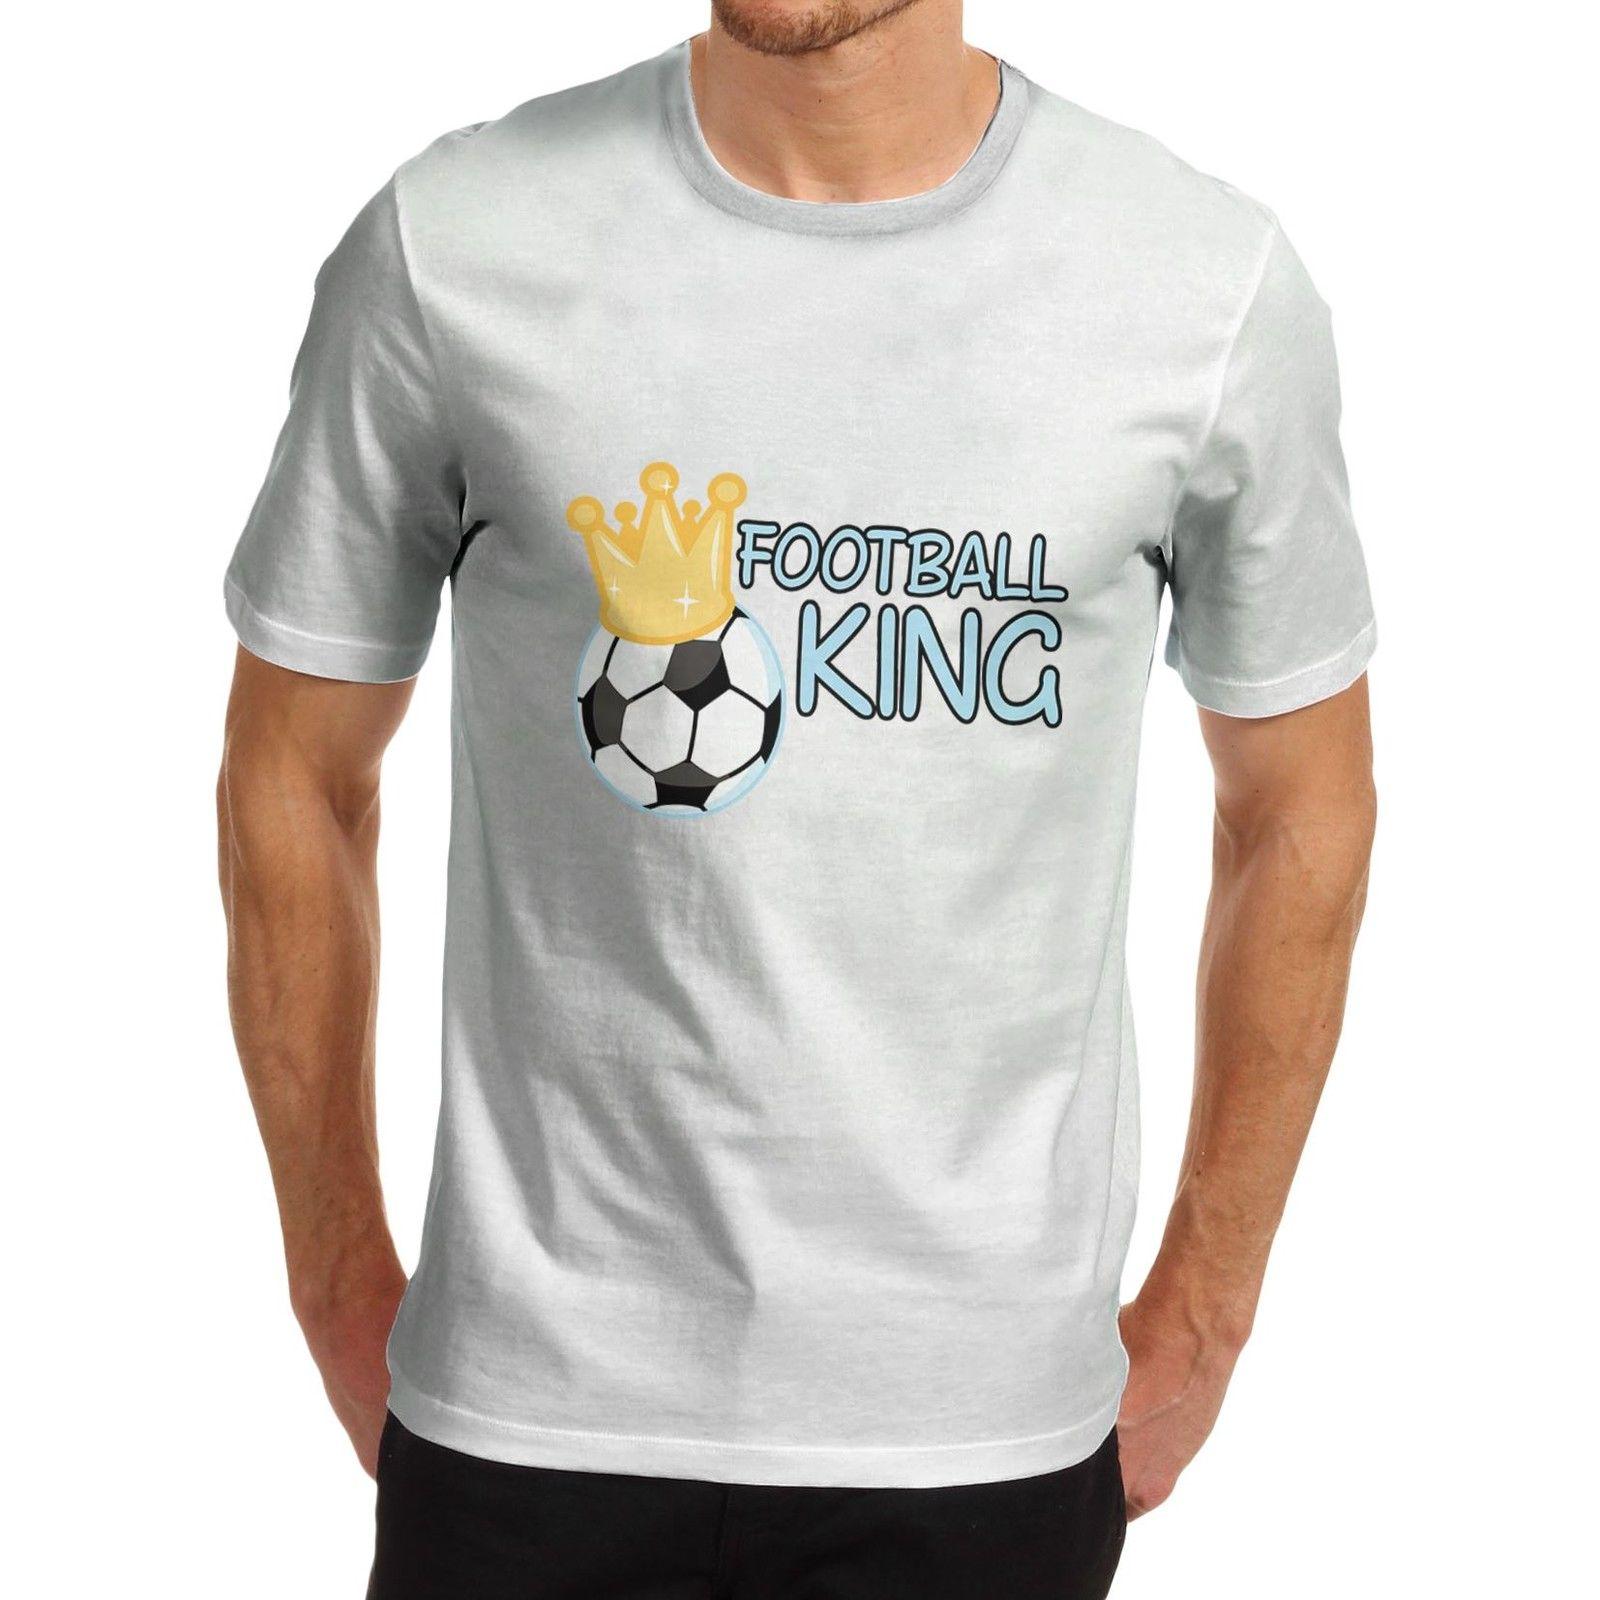 Design tshirt online free shipping - Printed T Shirts Online Short Sleeve Zomer Crew Neck Cotton Novelty Sportser Design Footballer King T Shirts For Men